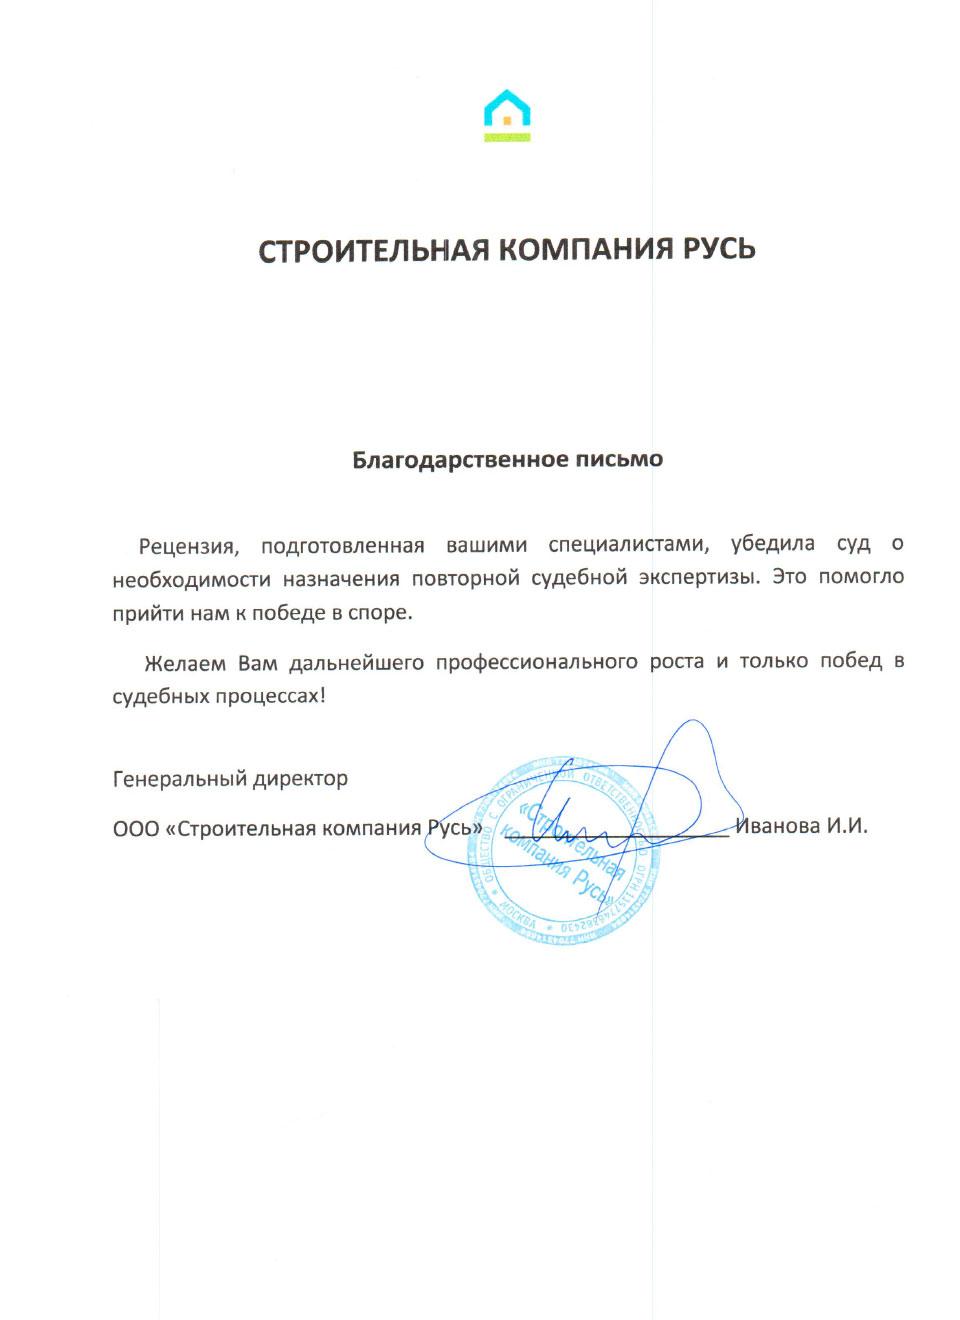 Краснодар рецензия на экспертизу 2511